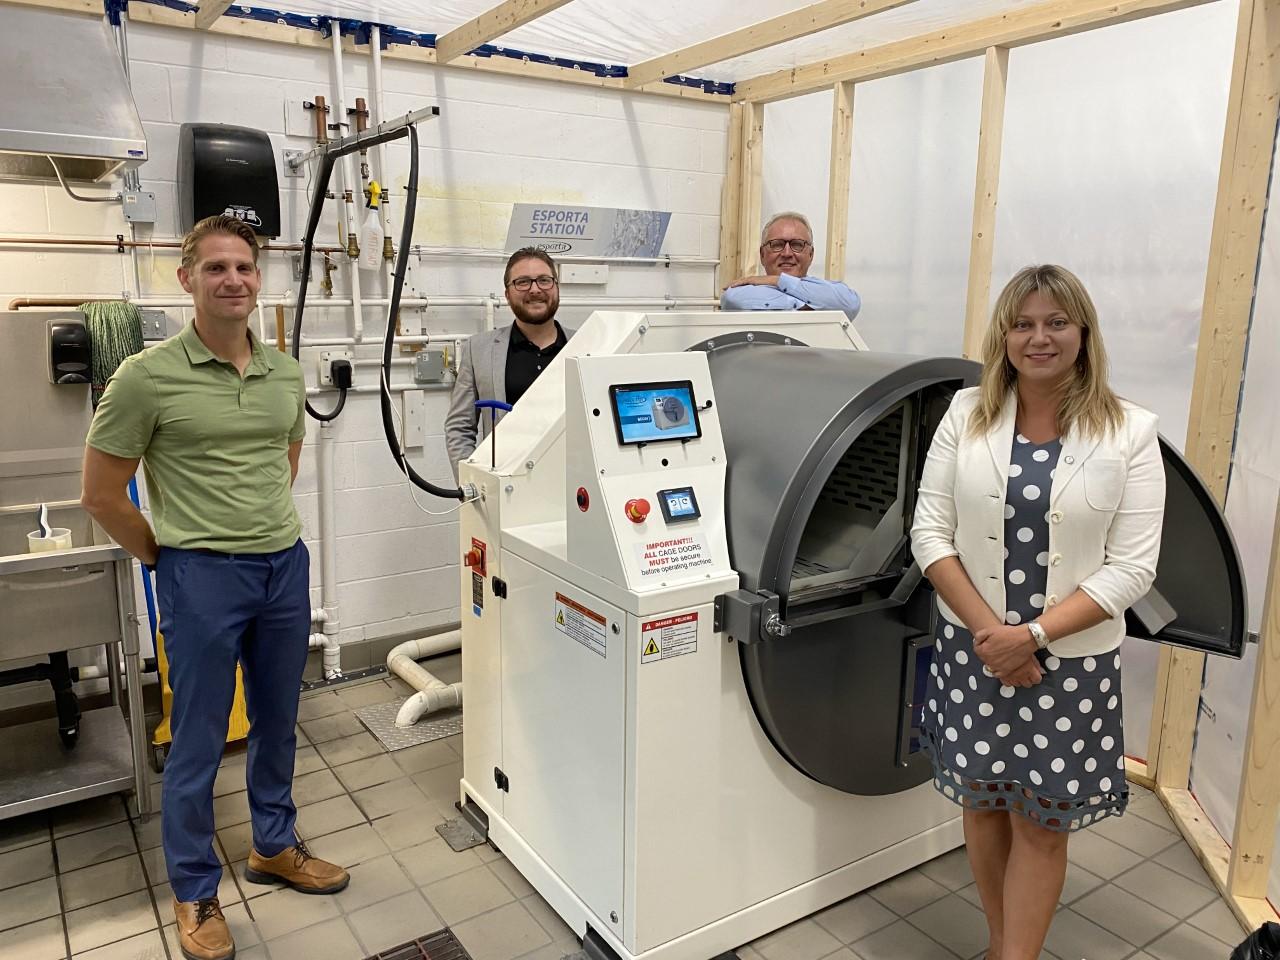 Touring Esporta Wash Systems